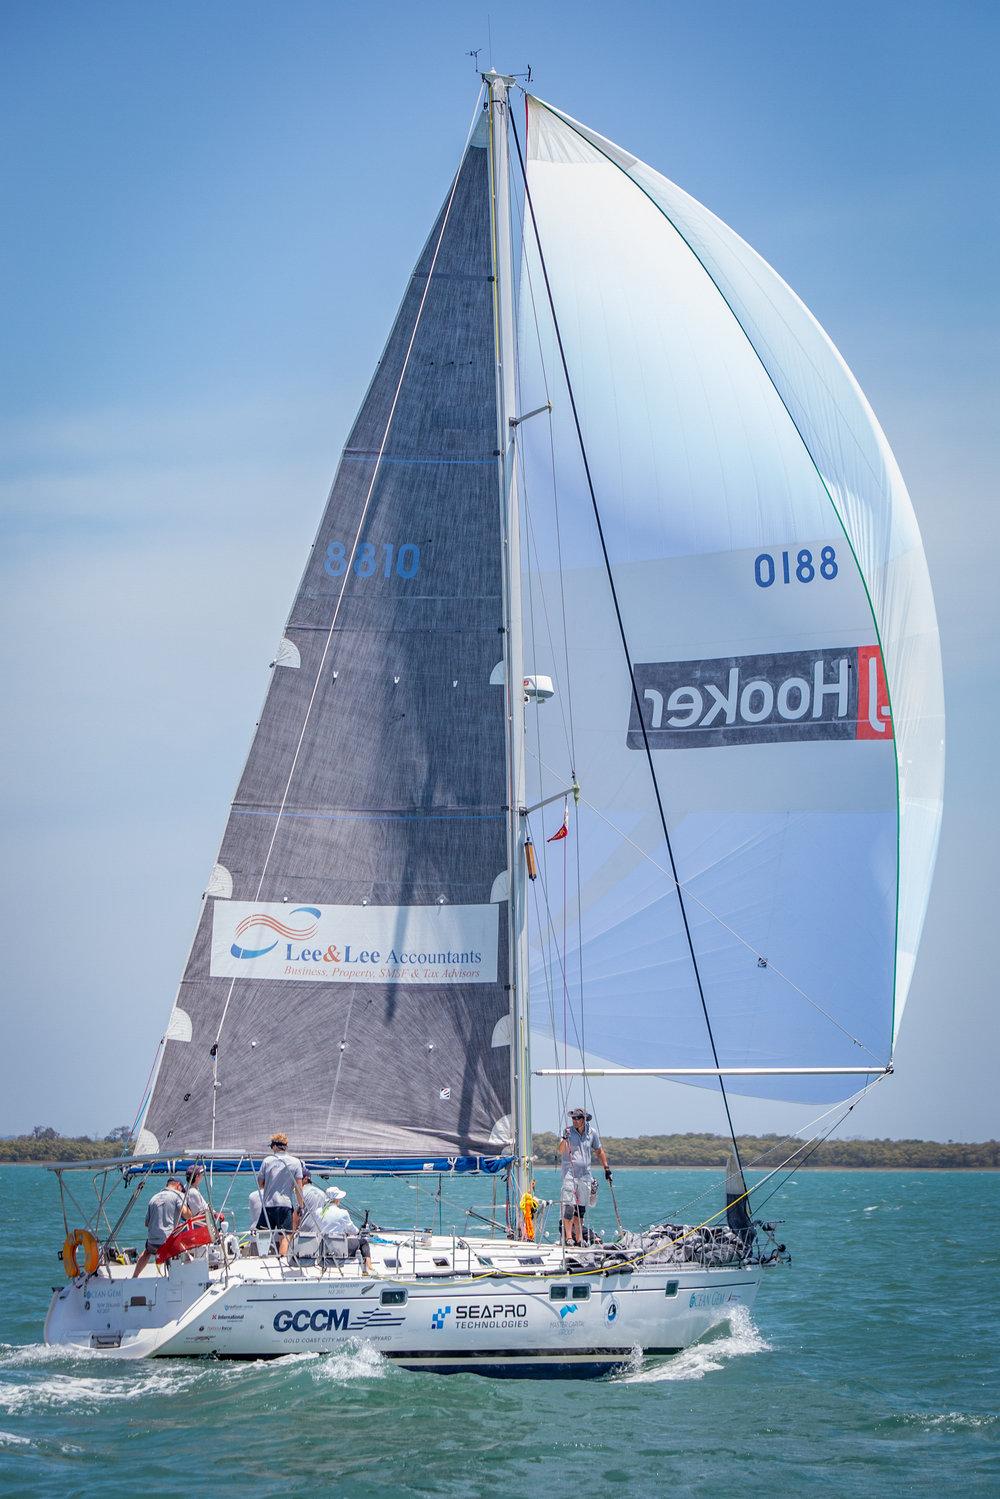 Ocean Gem competing at her 5th Queensland Beneteau Cup in 2018